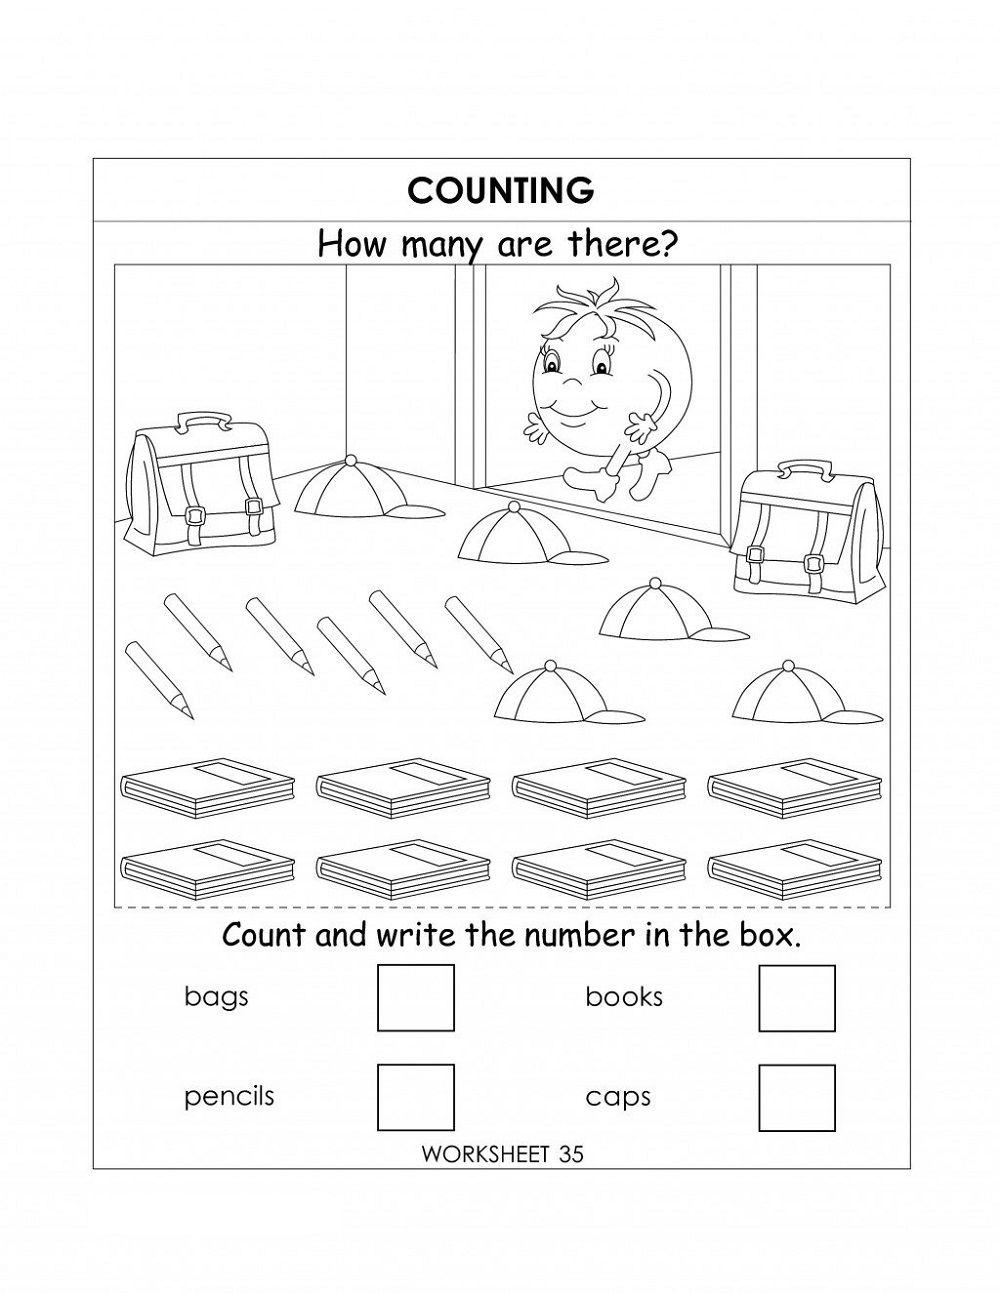 Ukg Worksheets Number worksheets kindergarten, Numbers